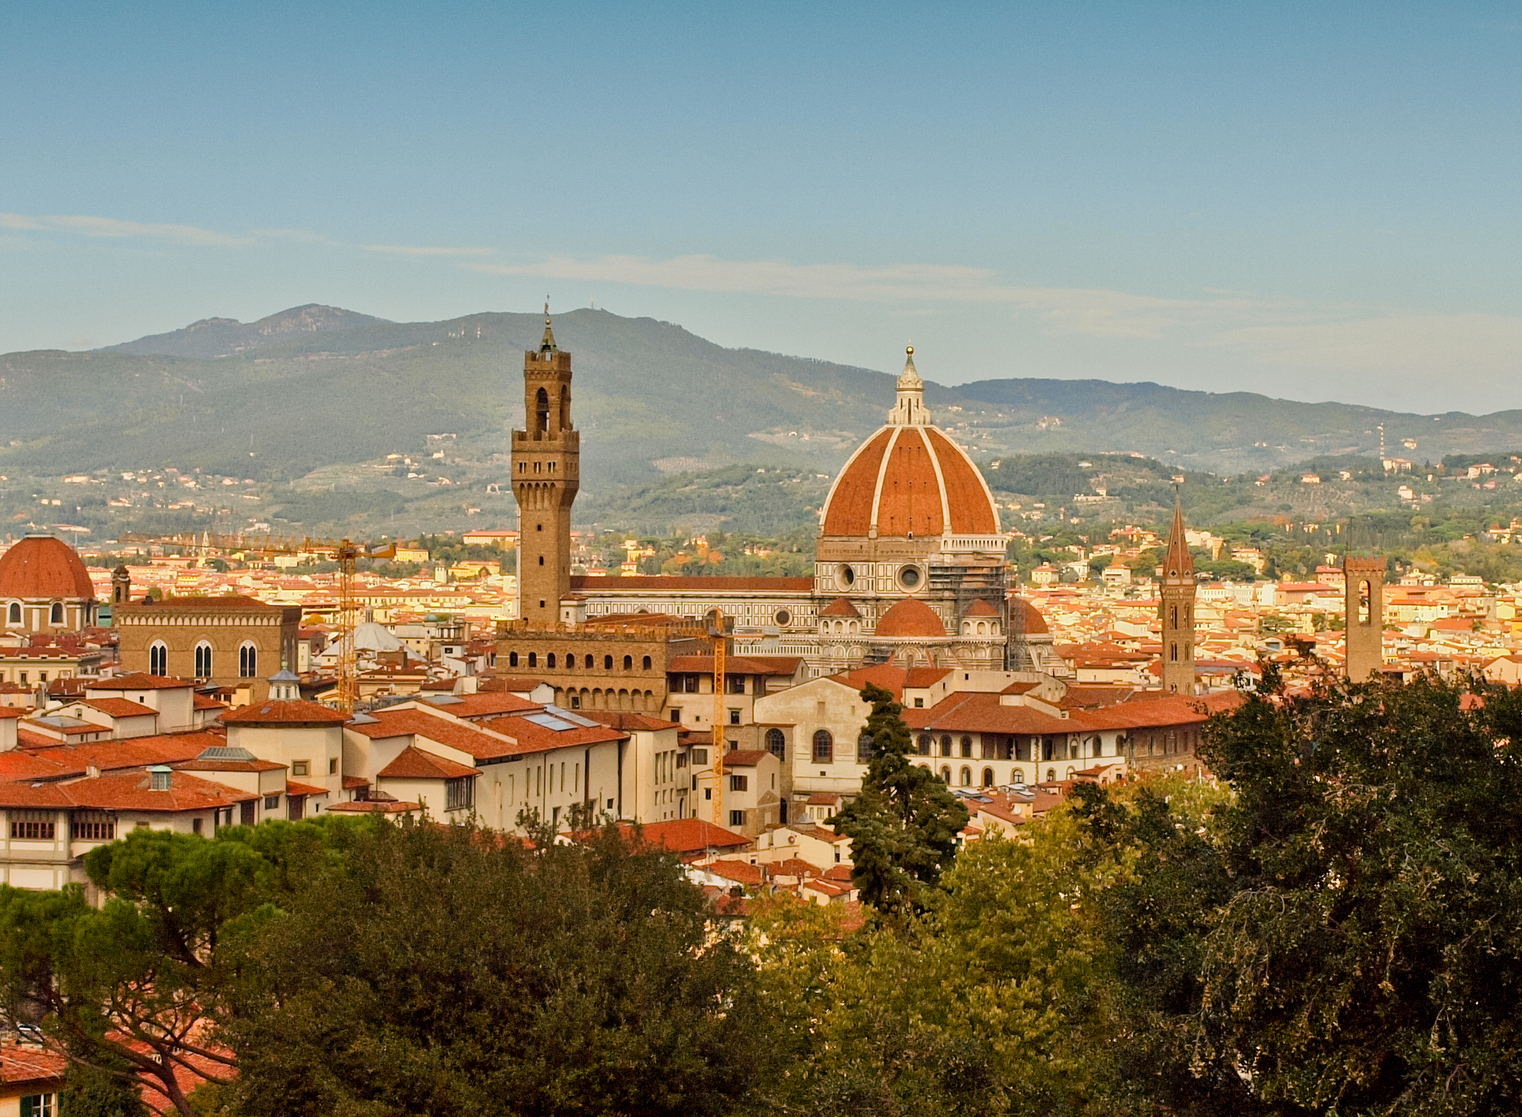 Duomo Florence, Italy